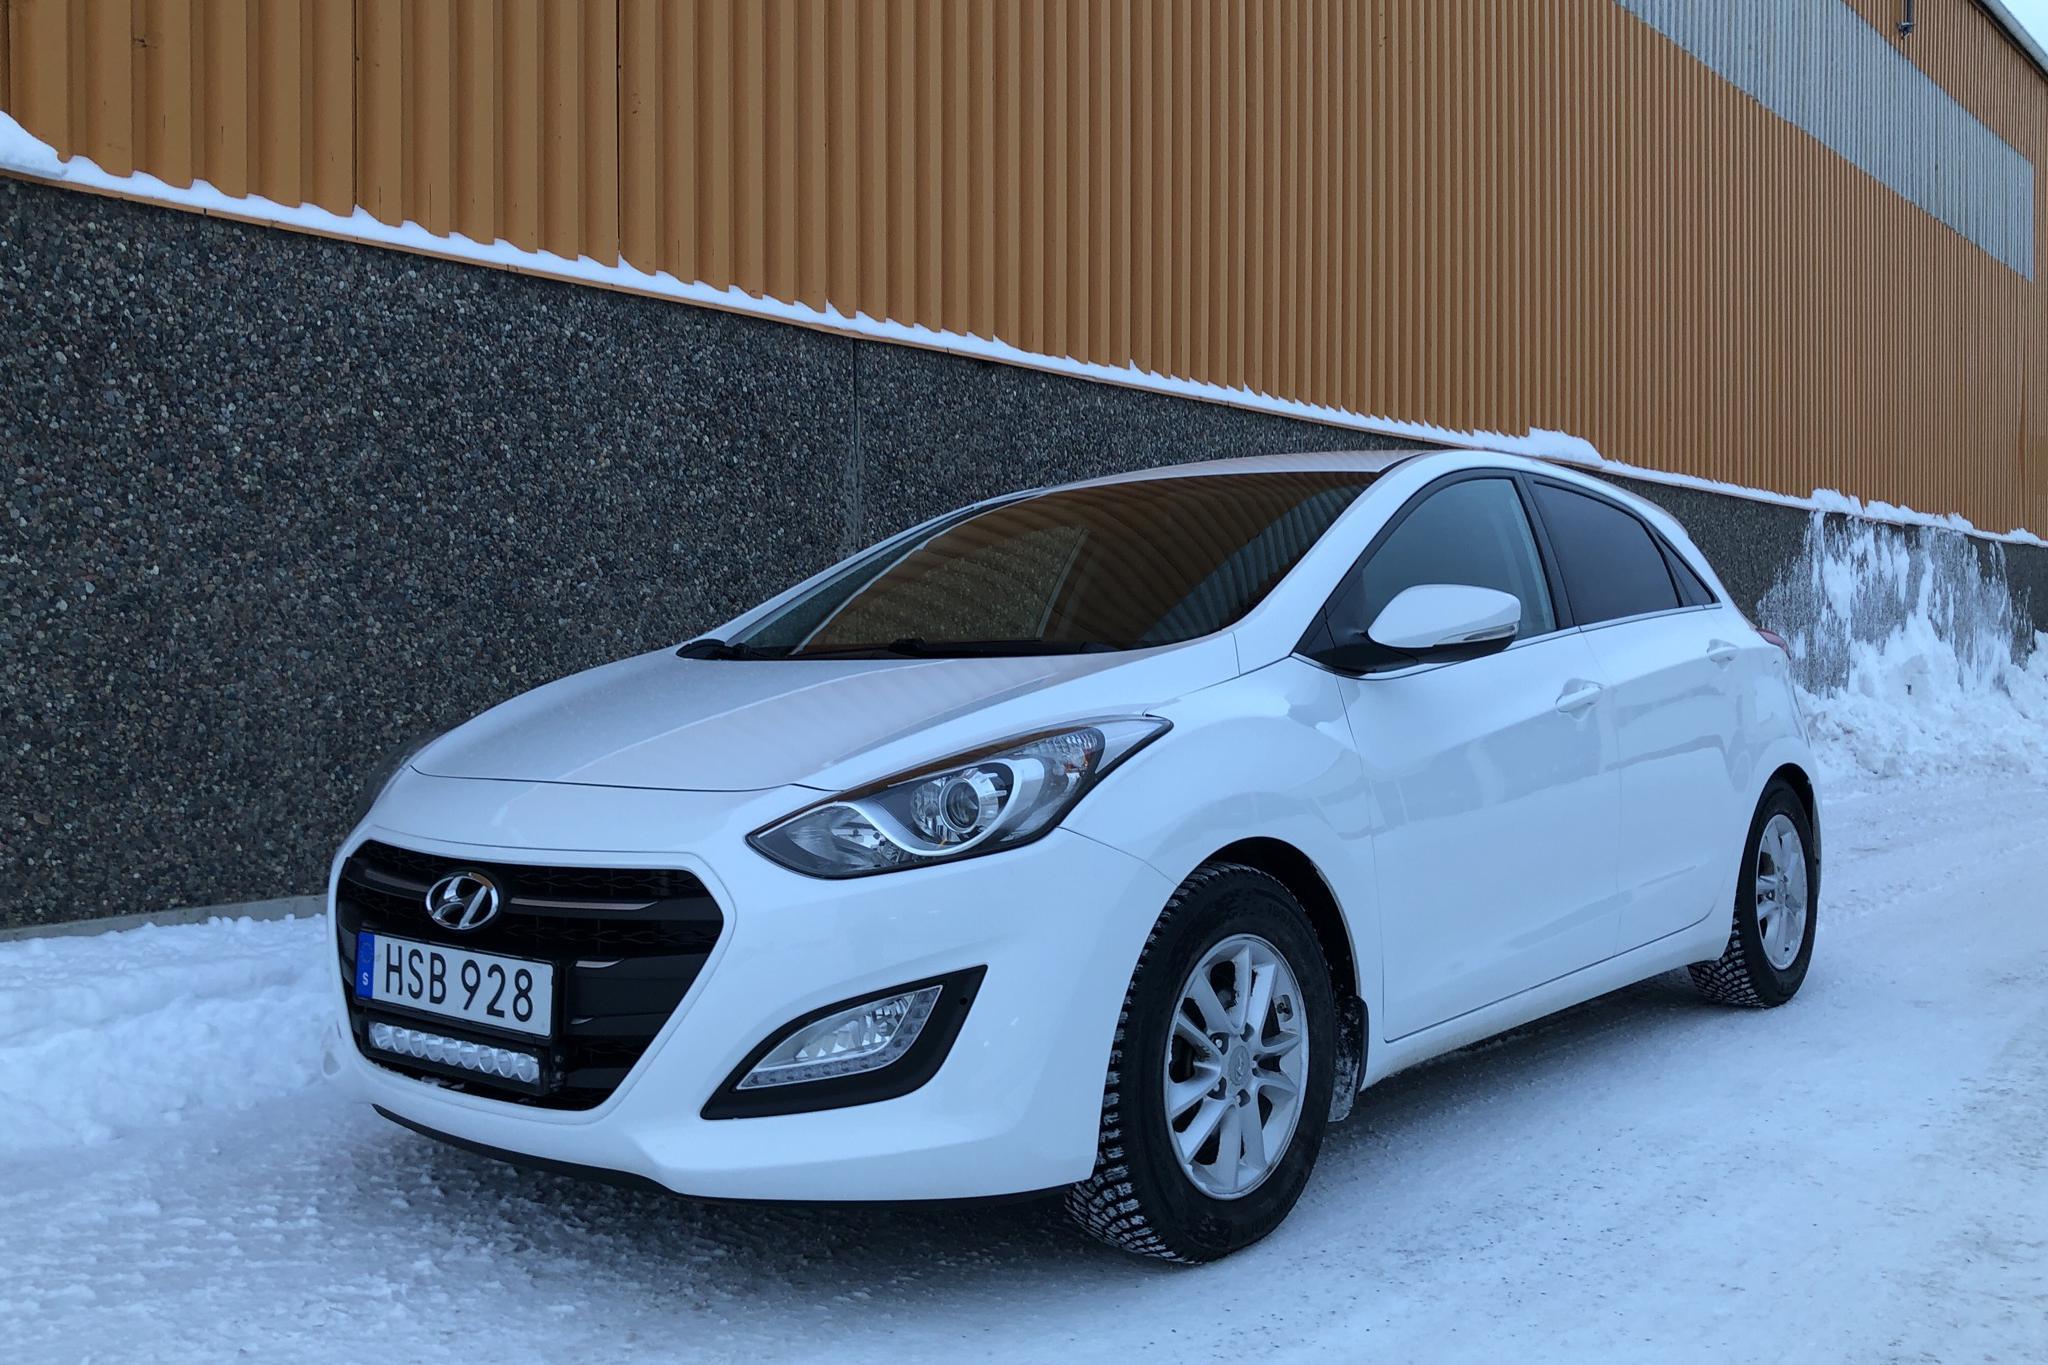 Hyundai i30 1.6 D 5dr (110hk) - 6 240 mil - Automat - vit - 2015